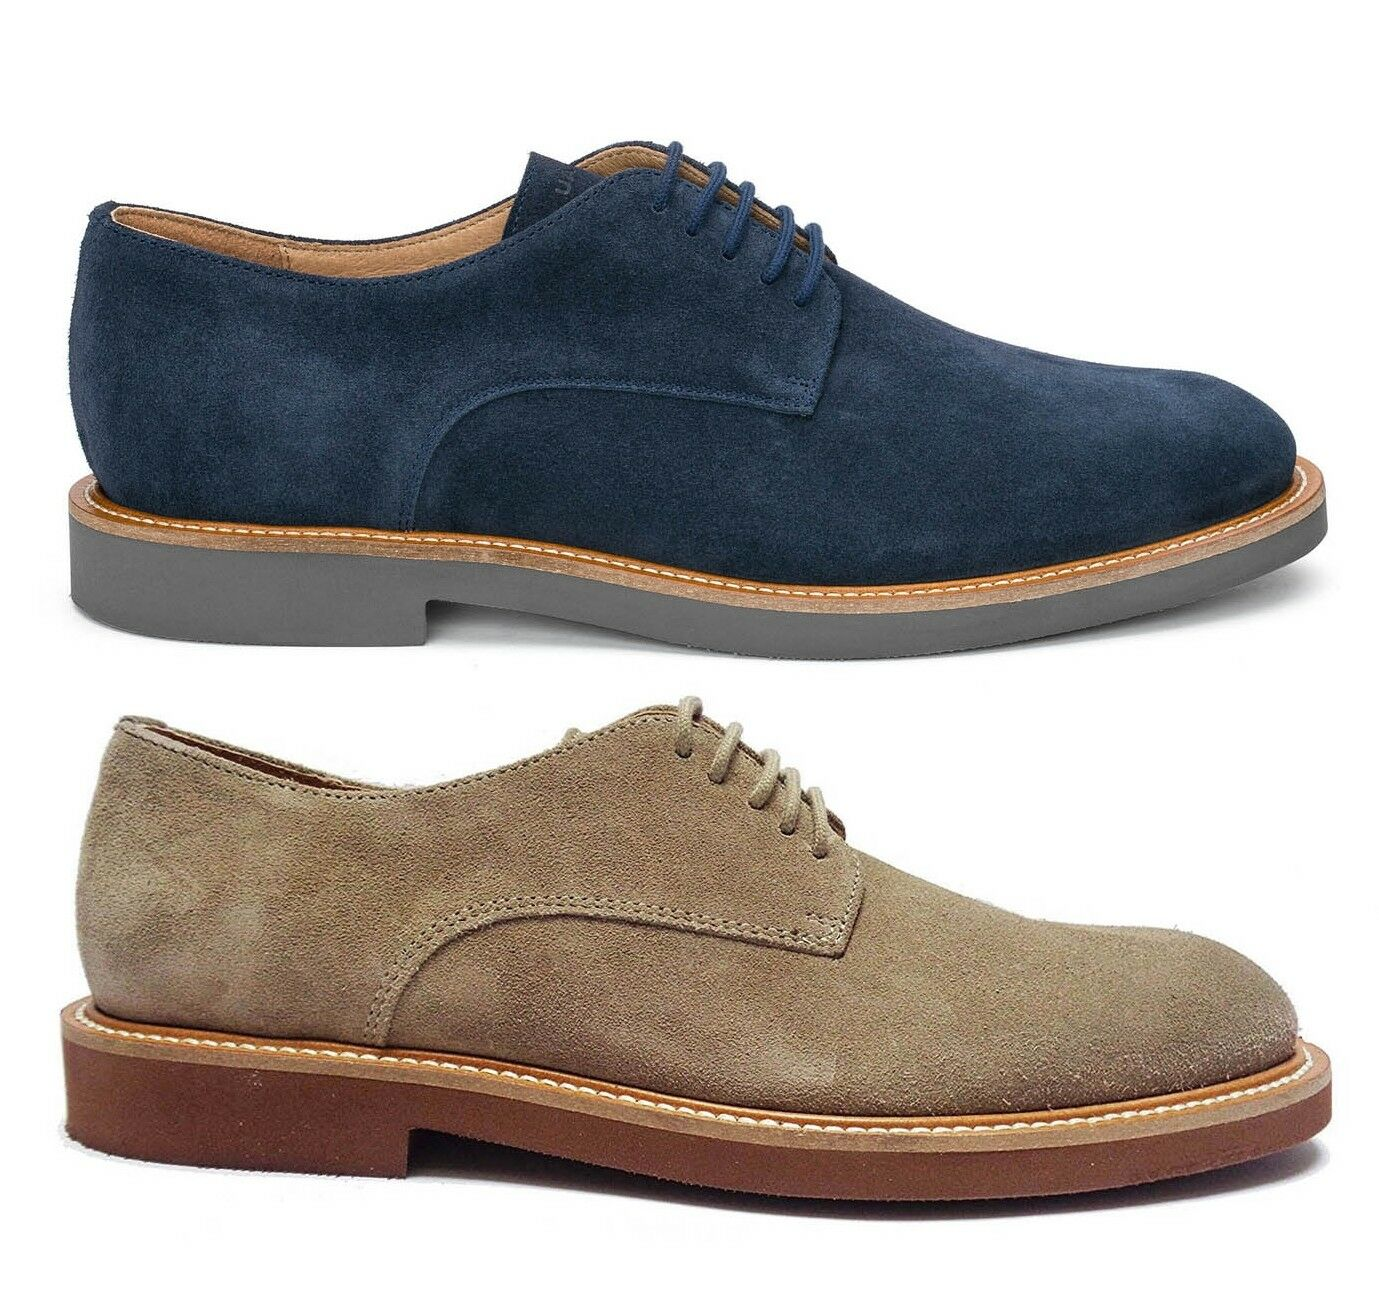 Frau 35A1 Blau Blau Blau Kork Schuhe Herren Stiefeletten